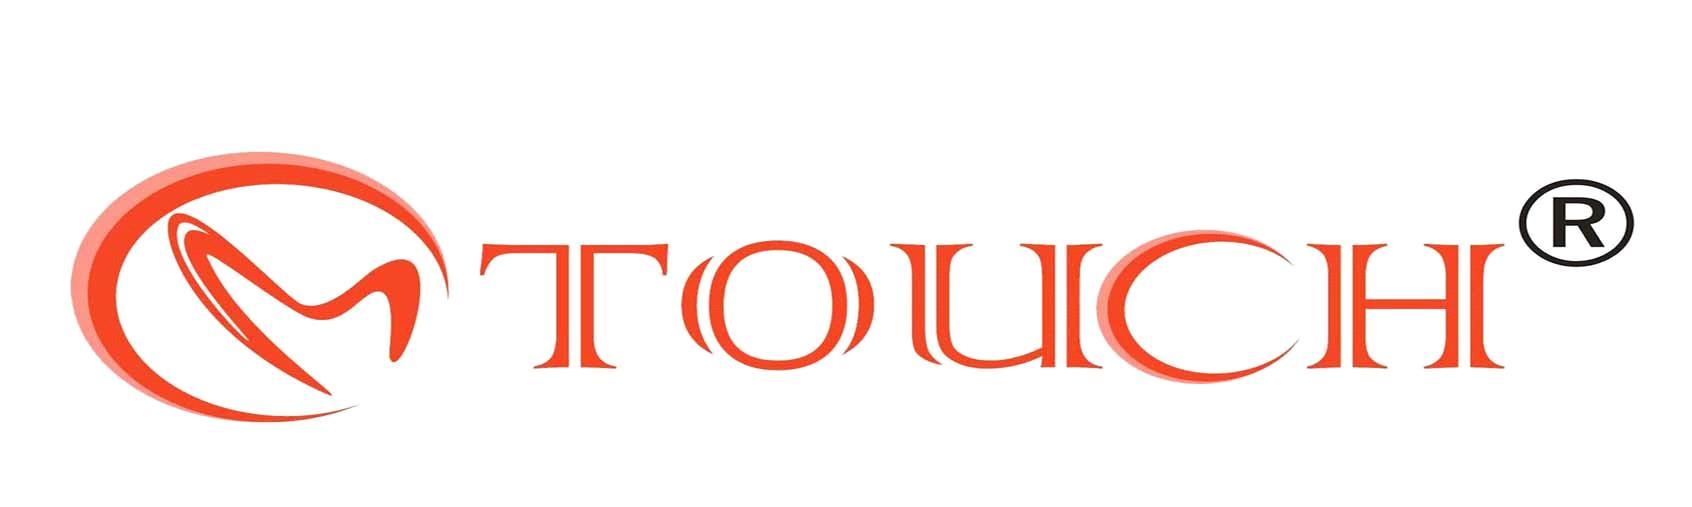 Guangzhou CMTouch Information & Technology Co., Ltd.